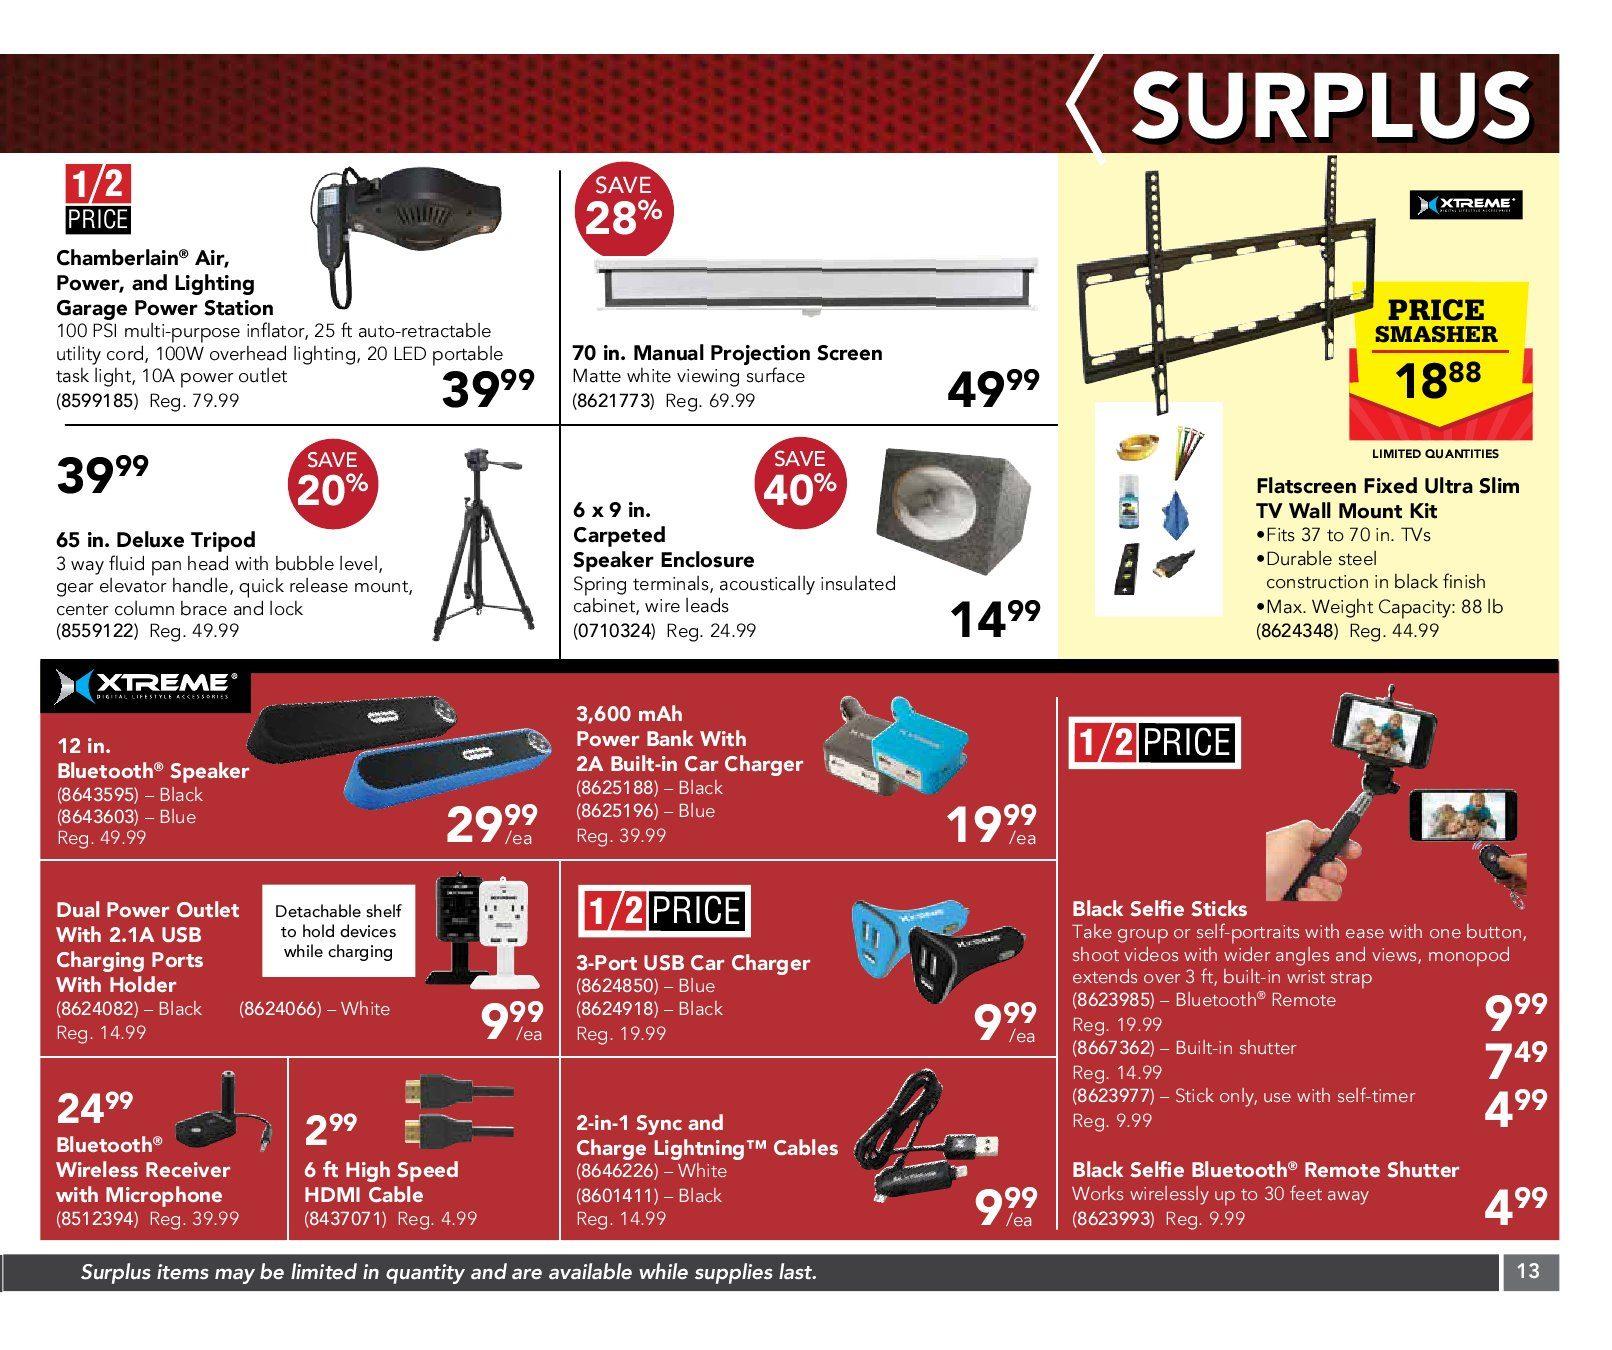 Princess Auto Weekly Flyer Mega Smasher Mar 8 20 4x12 Speaker Cabinet Wiring Stereo Mono Google Groups